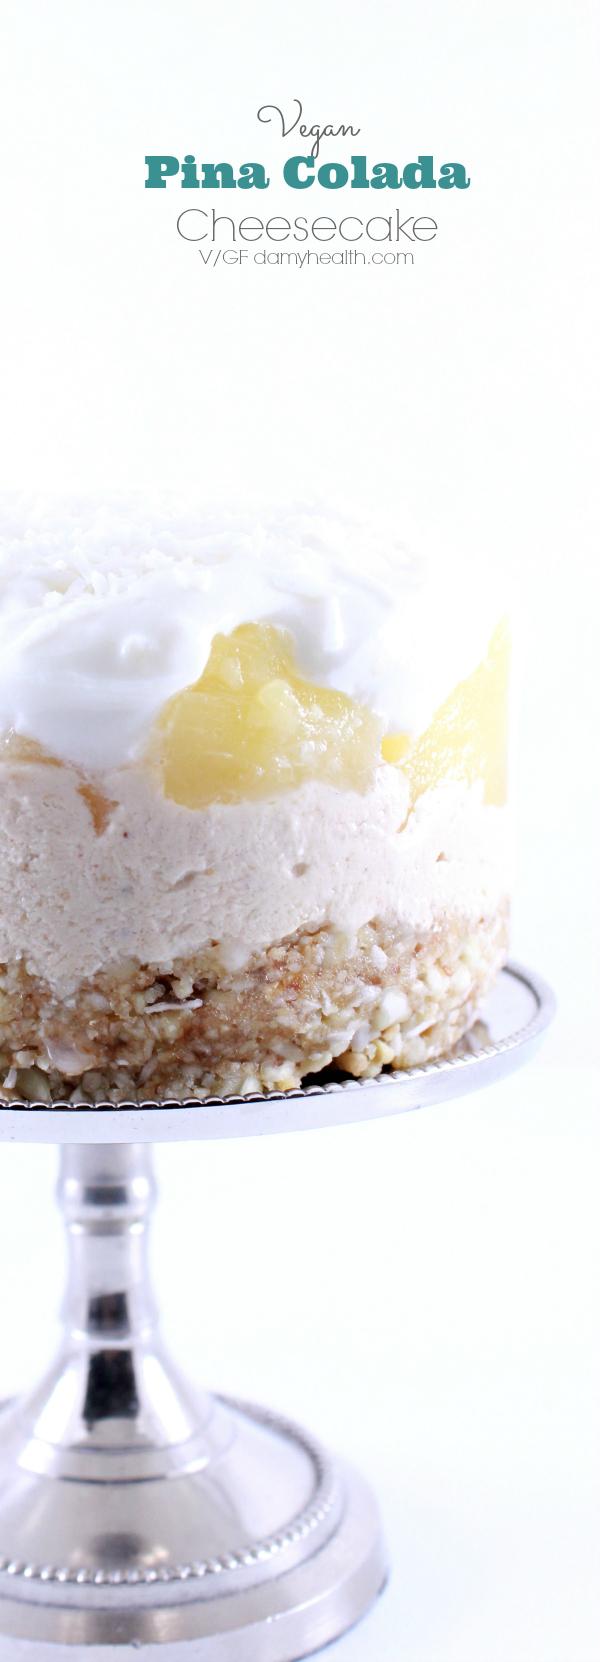 Vegan Pina Colada Cheesecake